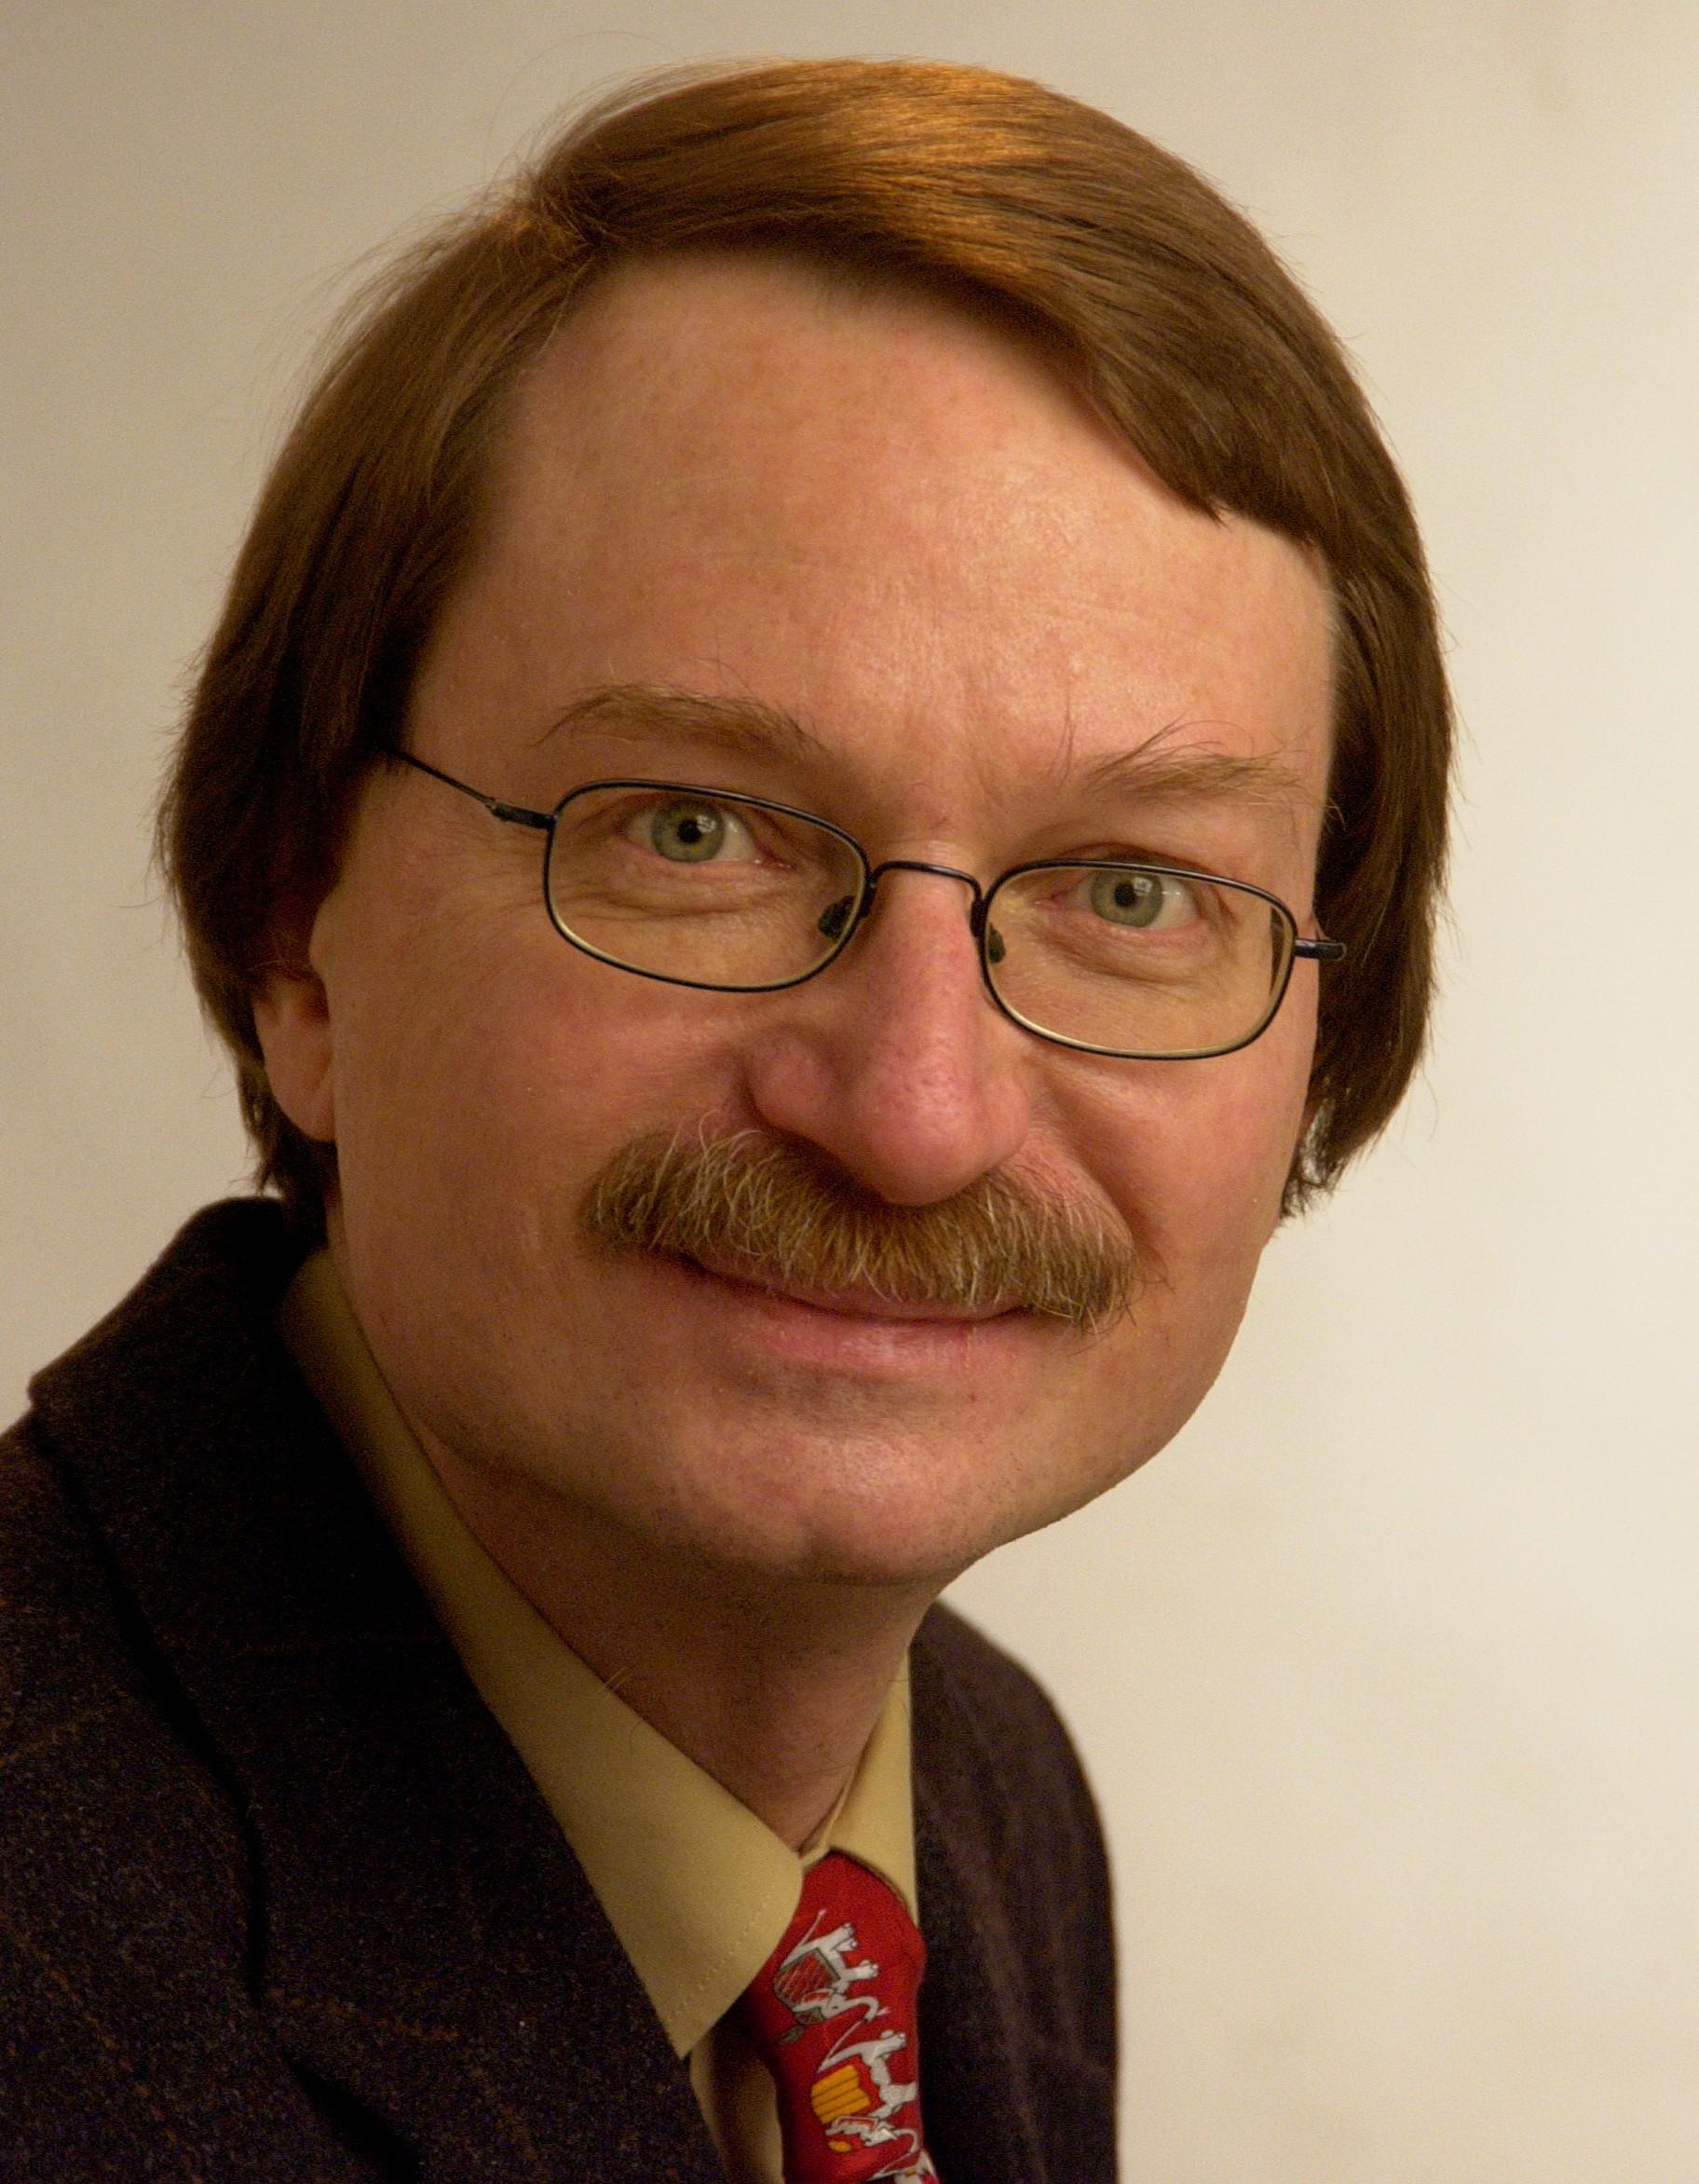 Jörg Bewersdorff (2006)